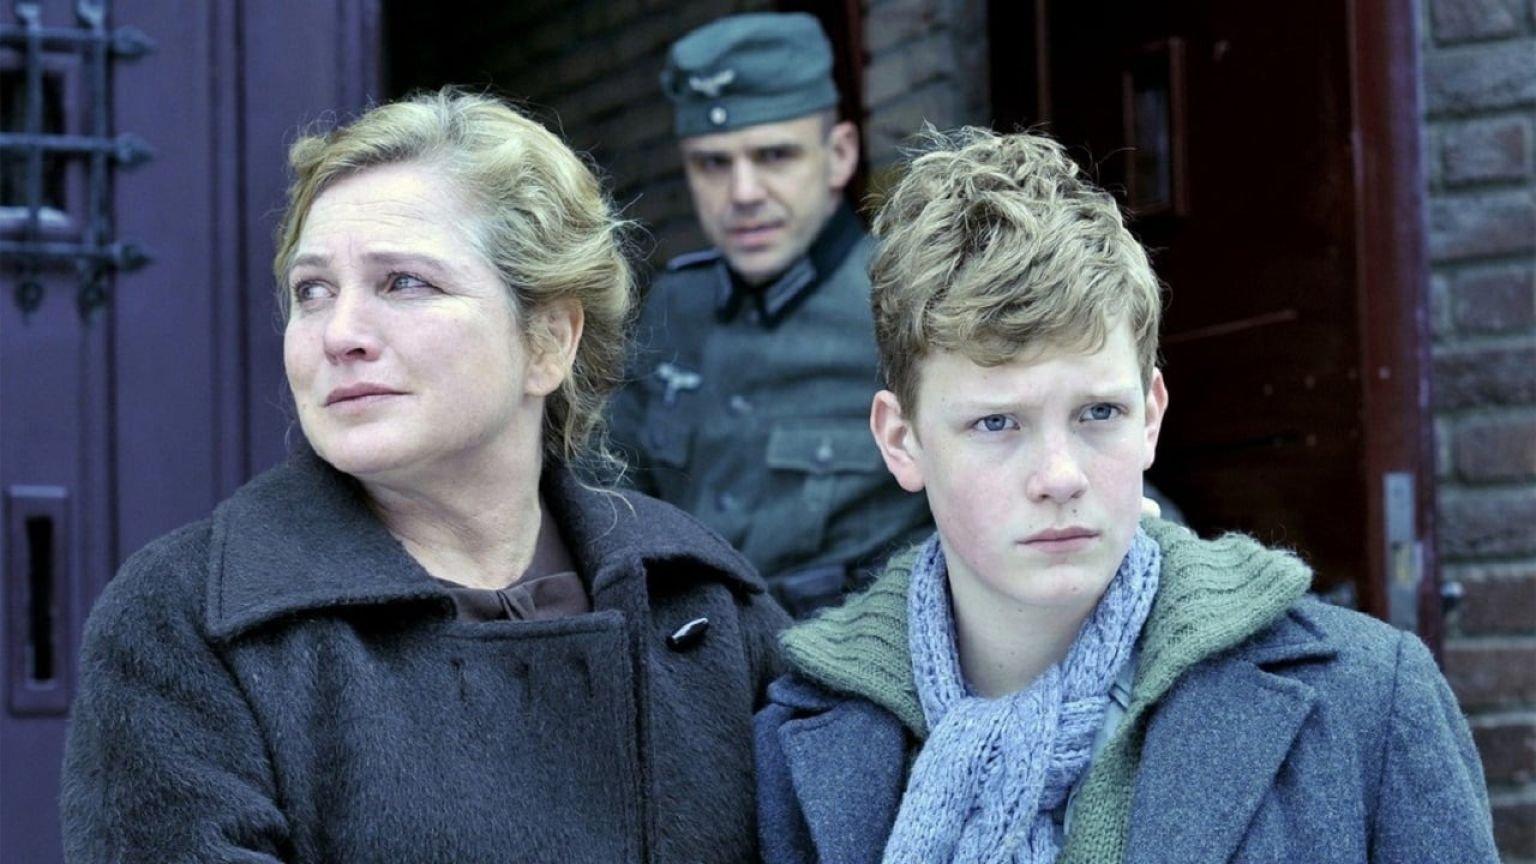 Vanavond op tv: Nederlandse dramafilm 'Oorlogswinter'